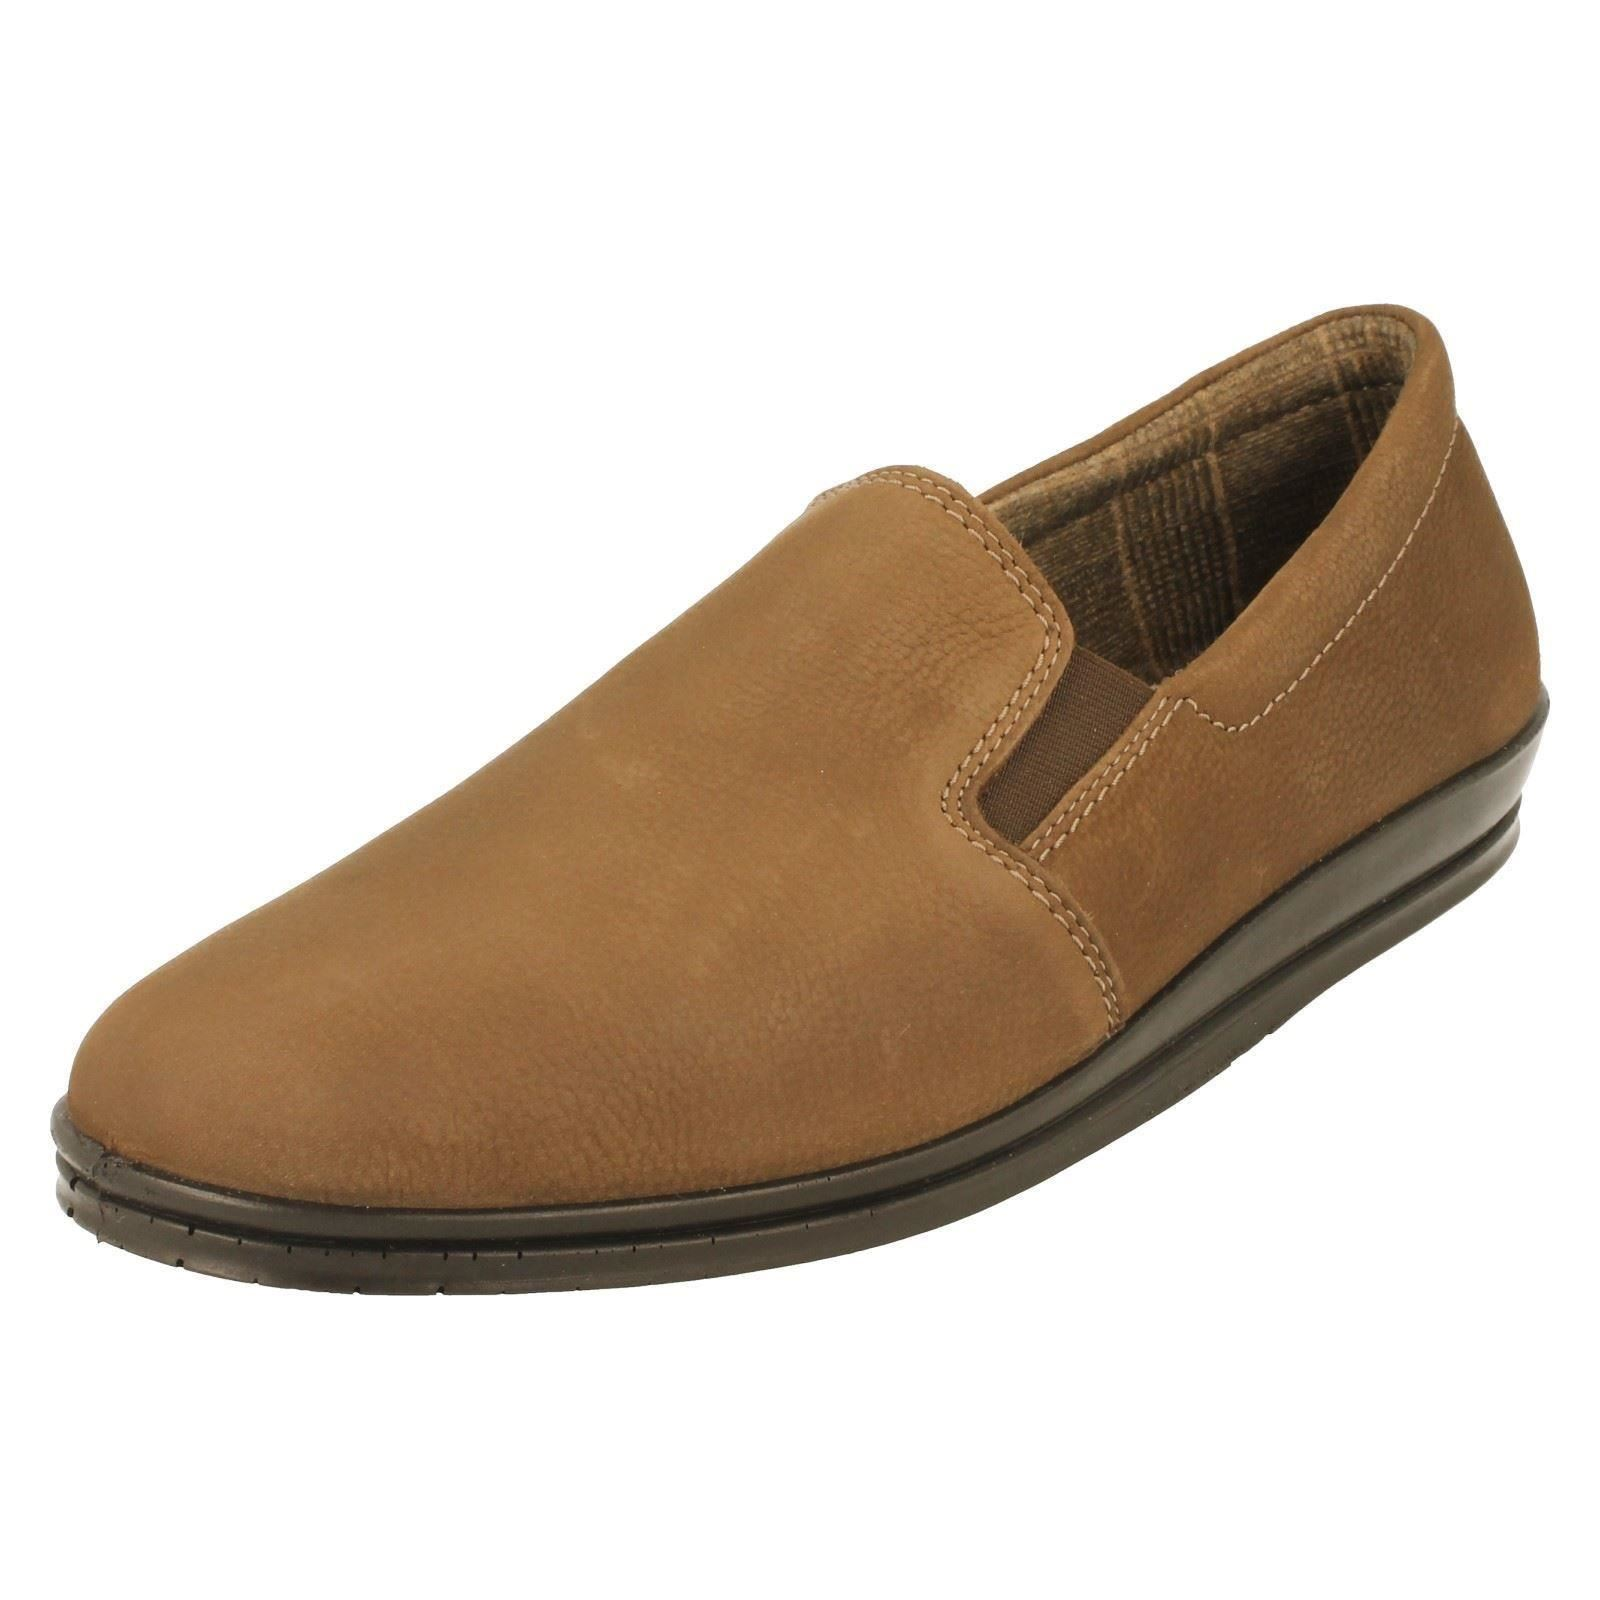 Rohde Donna Pantofole Pantofole Pantofole Mulo Stile 2608-w a88748